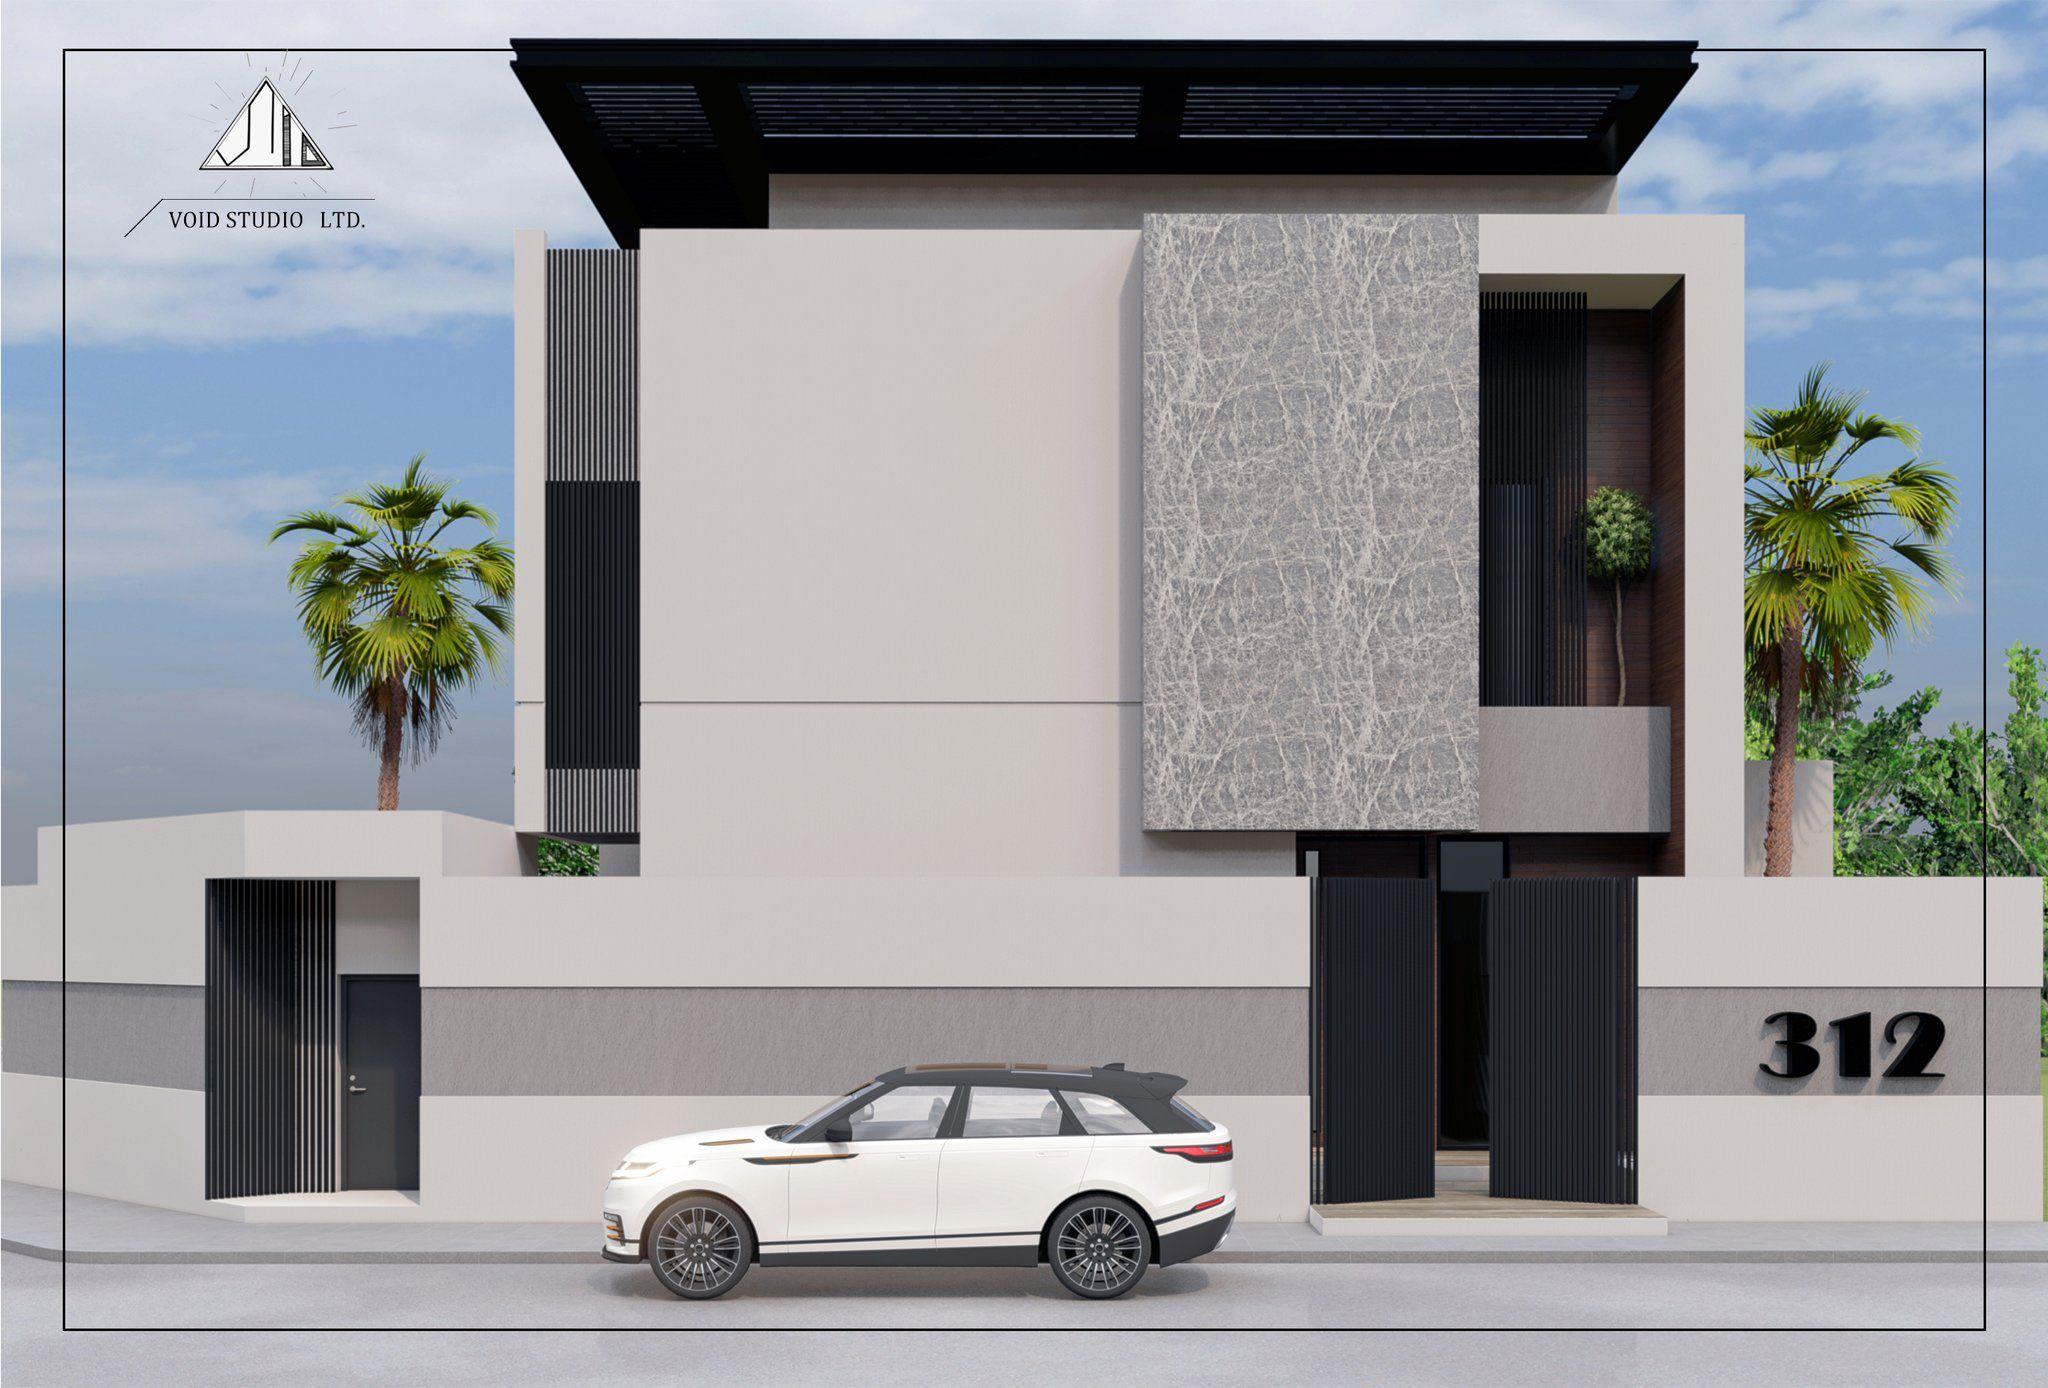 Pin By Marja Al Yami On واجهات خارجية Architecture Facade Flat Screen